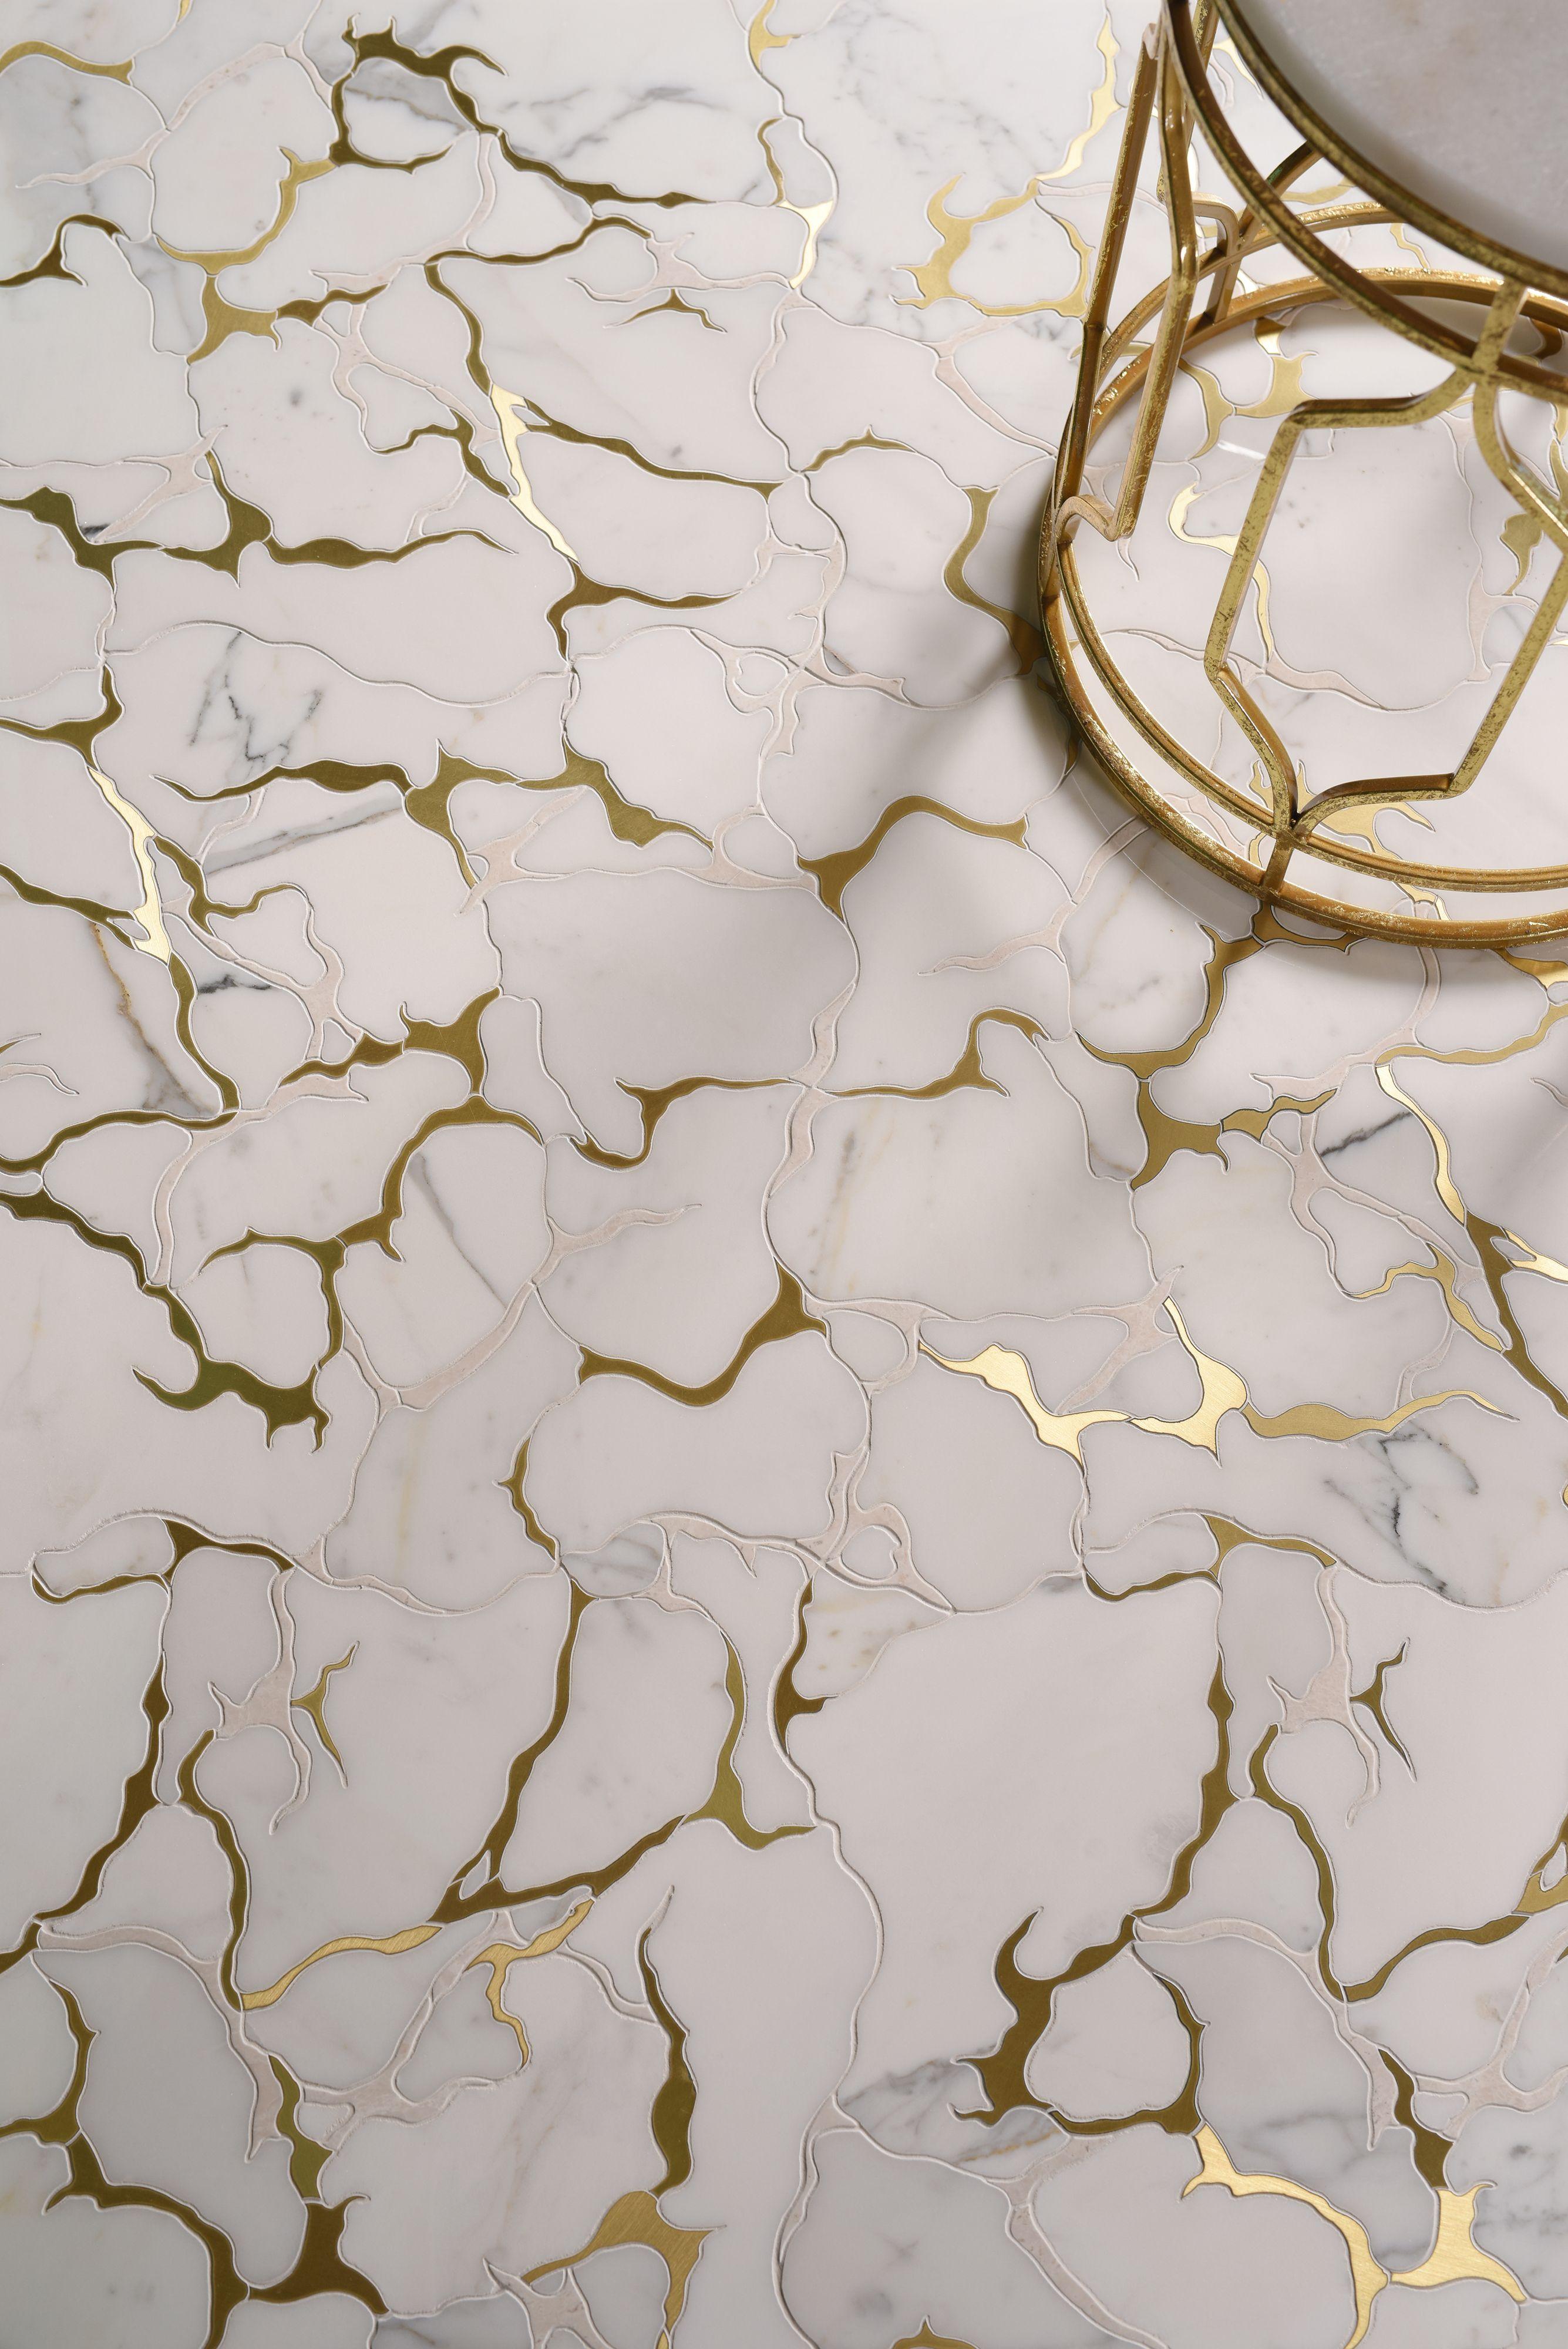 Gold Veined Marble Mosaic Floor Tile Marble Mosaic Floor Marble Tile Floor Mosaic Floor Tile